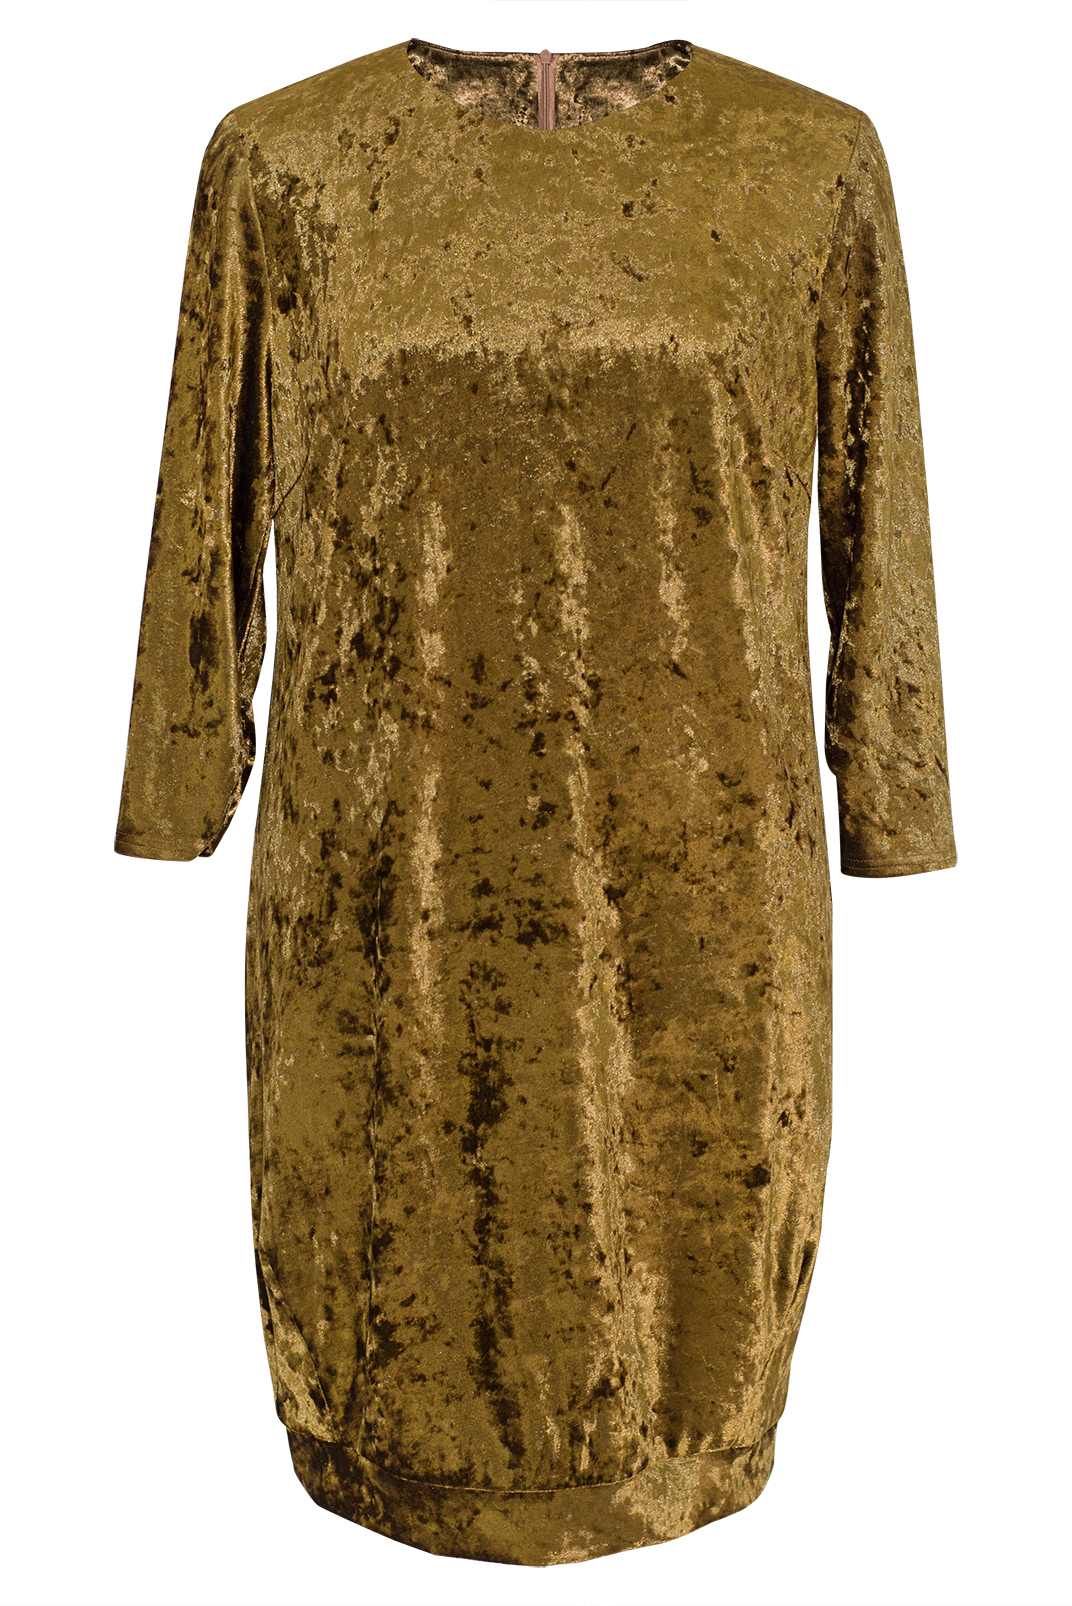 Mila Нарядное платье 272Х052075ЛП